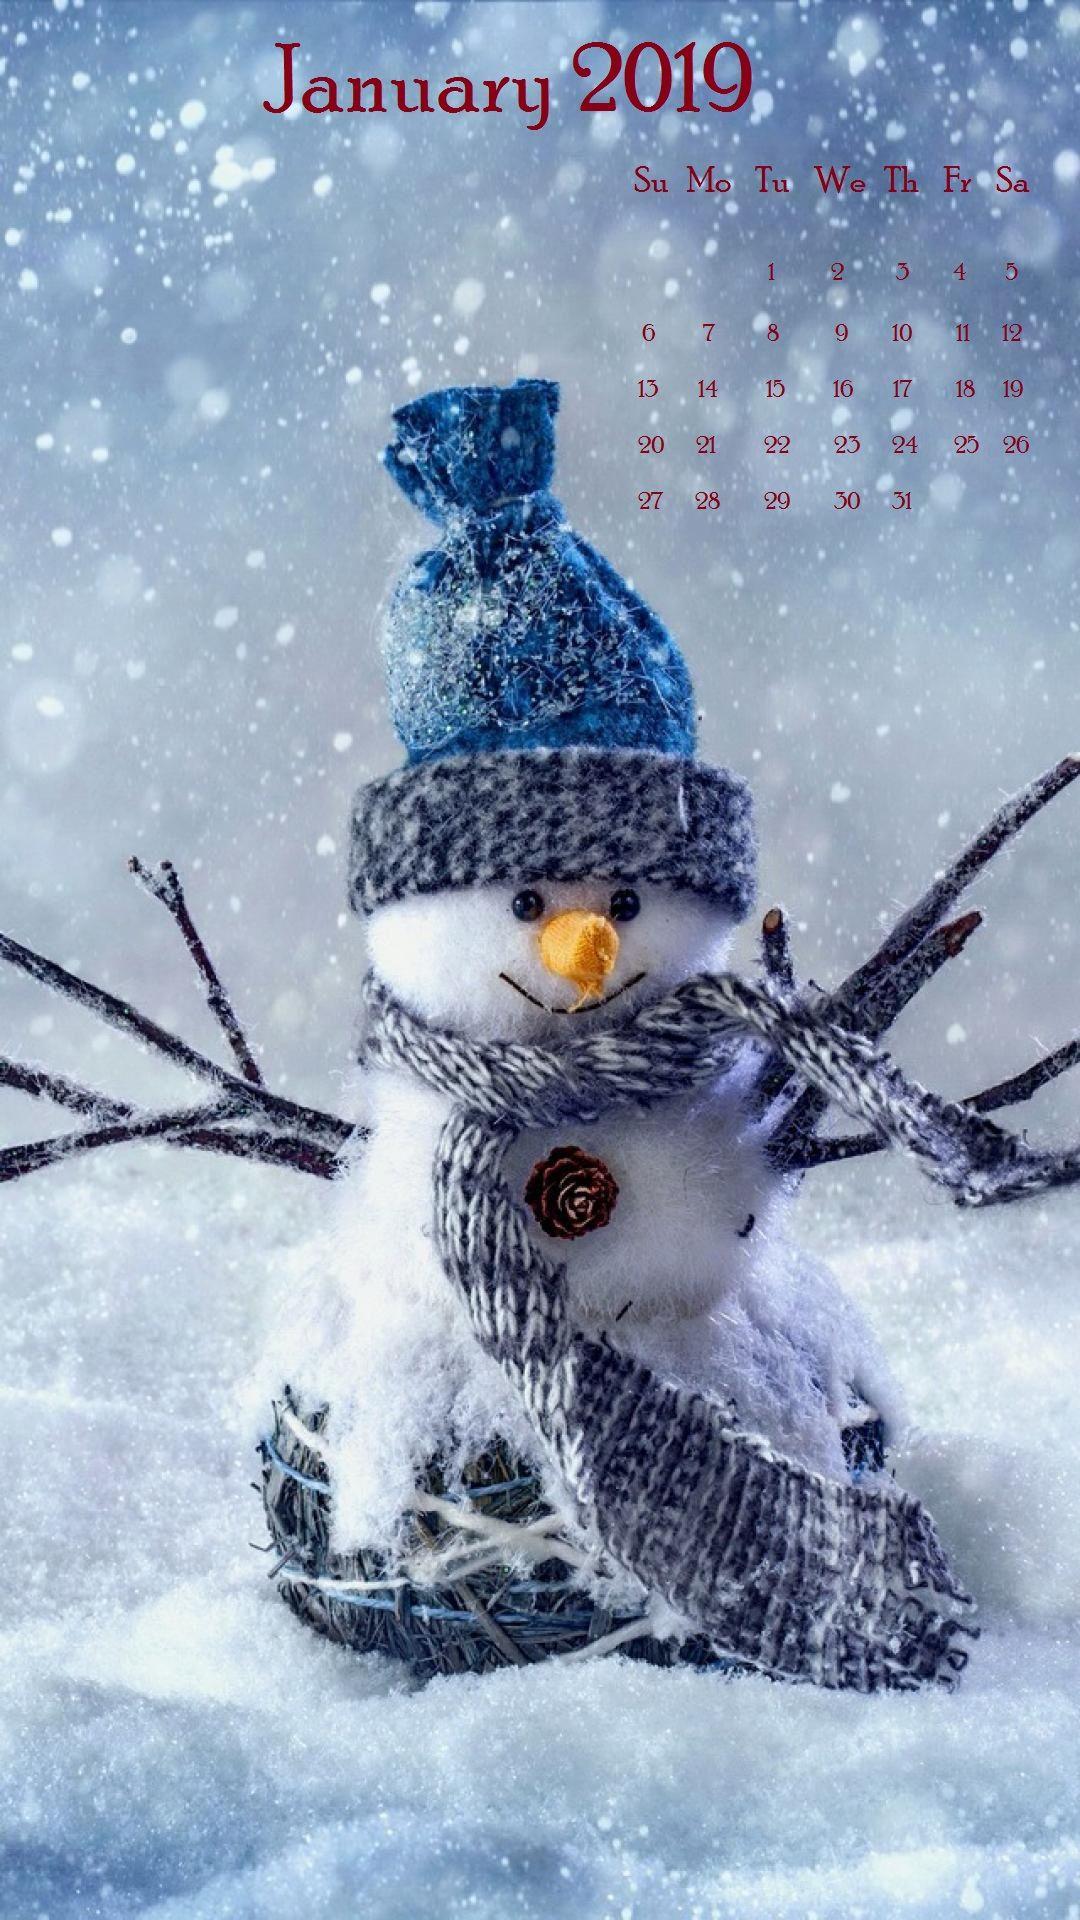 Snow january 2019 iPhone Calendar Christmas wallpaper